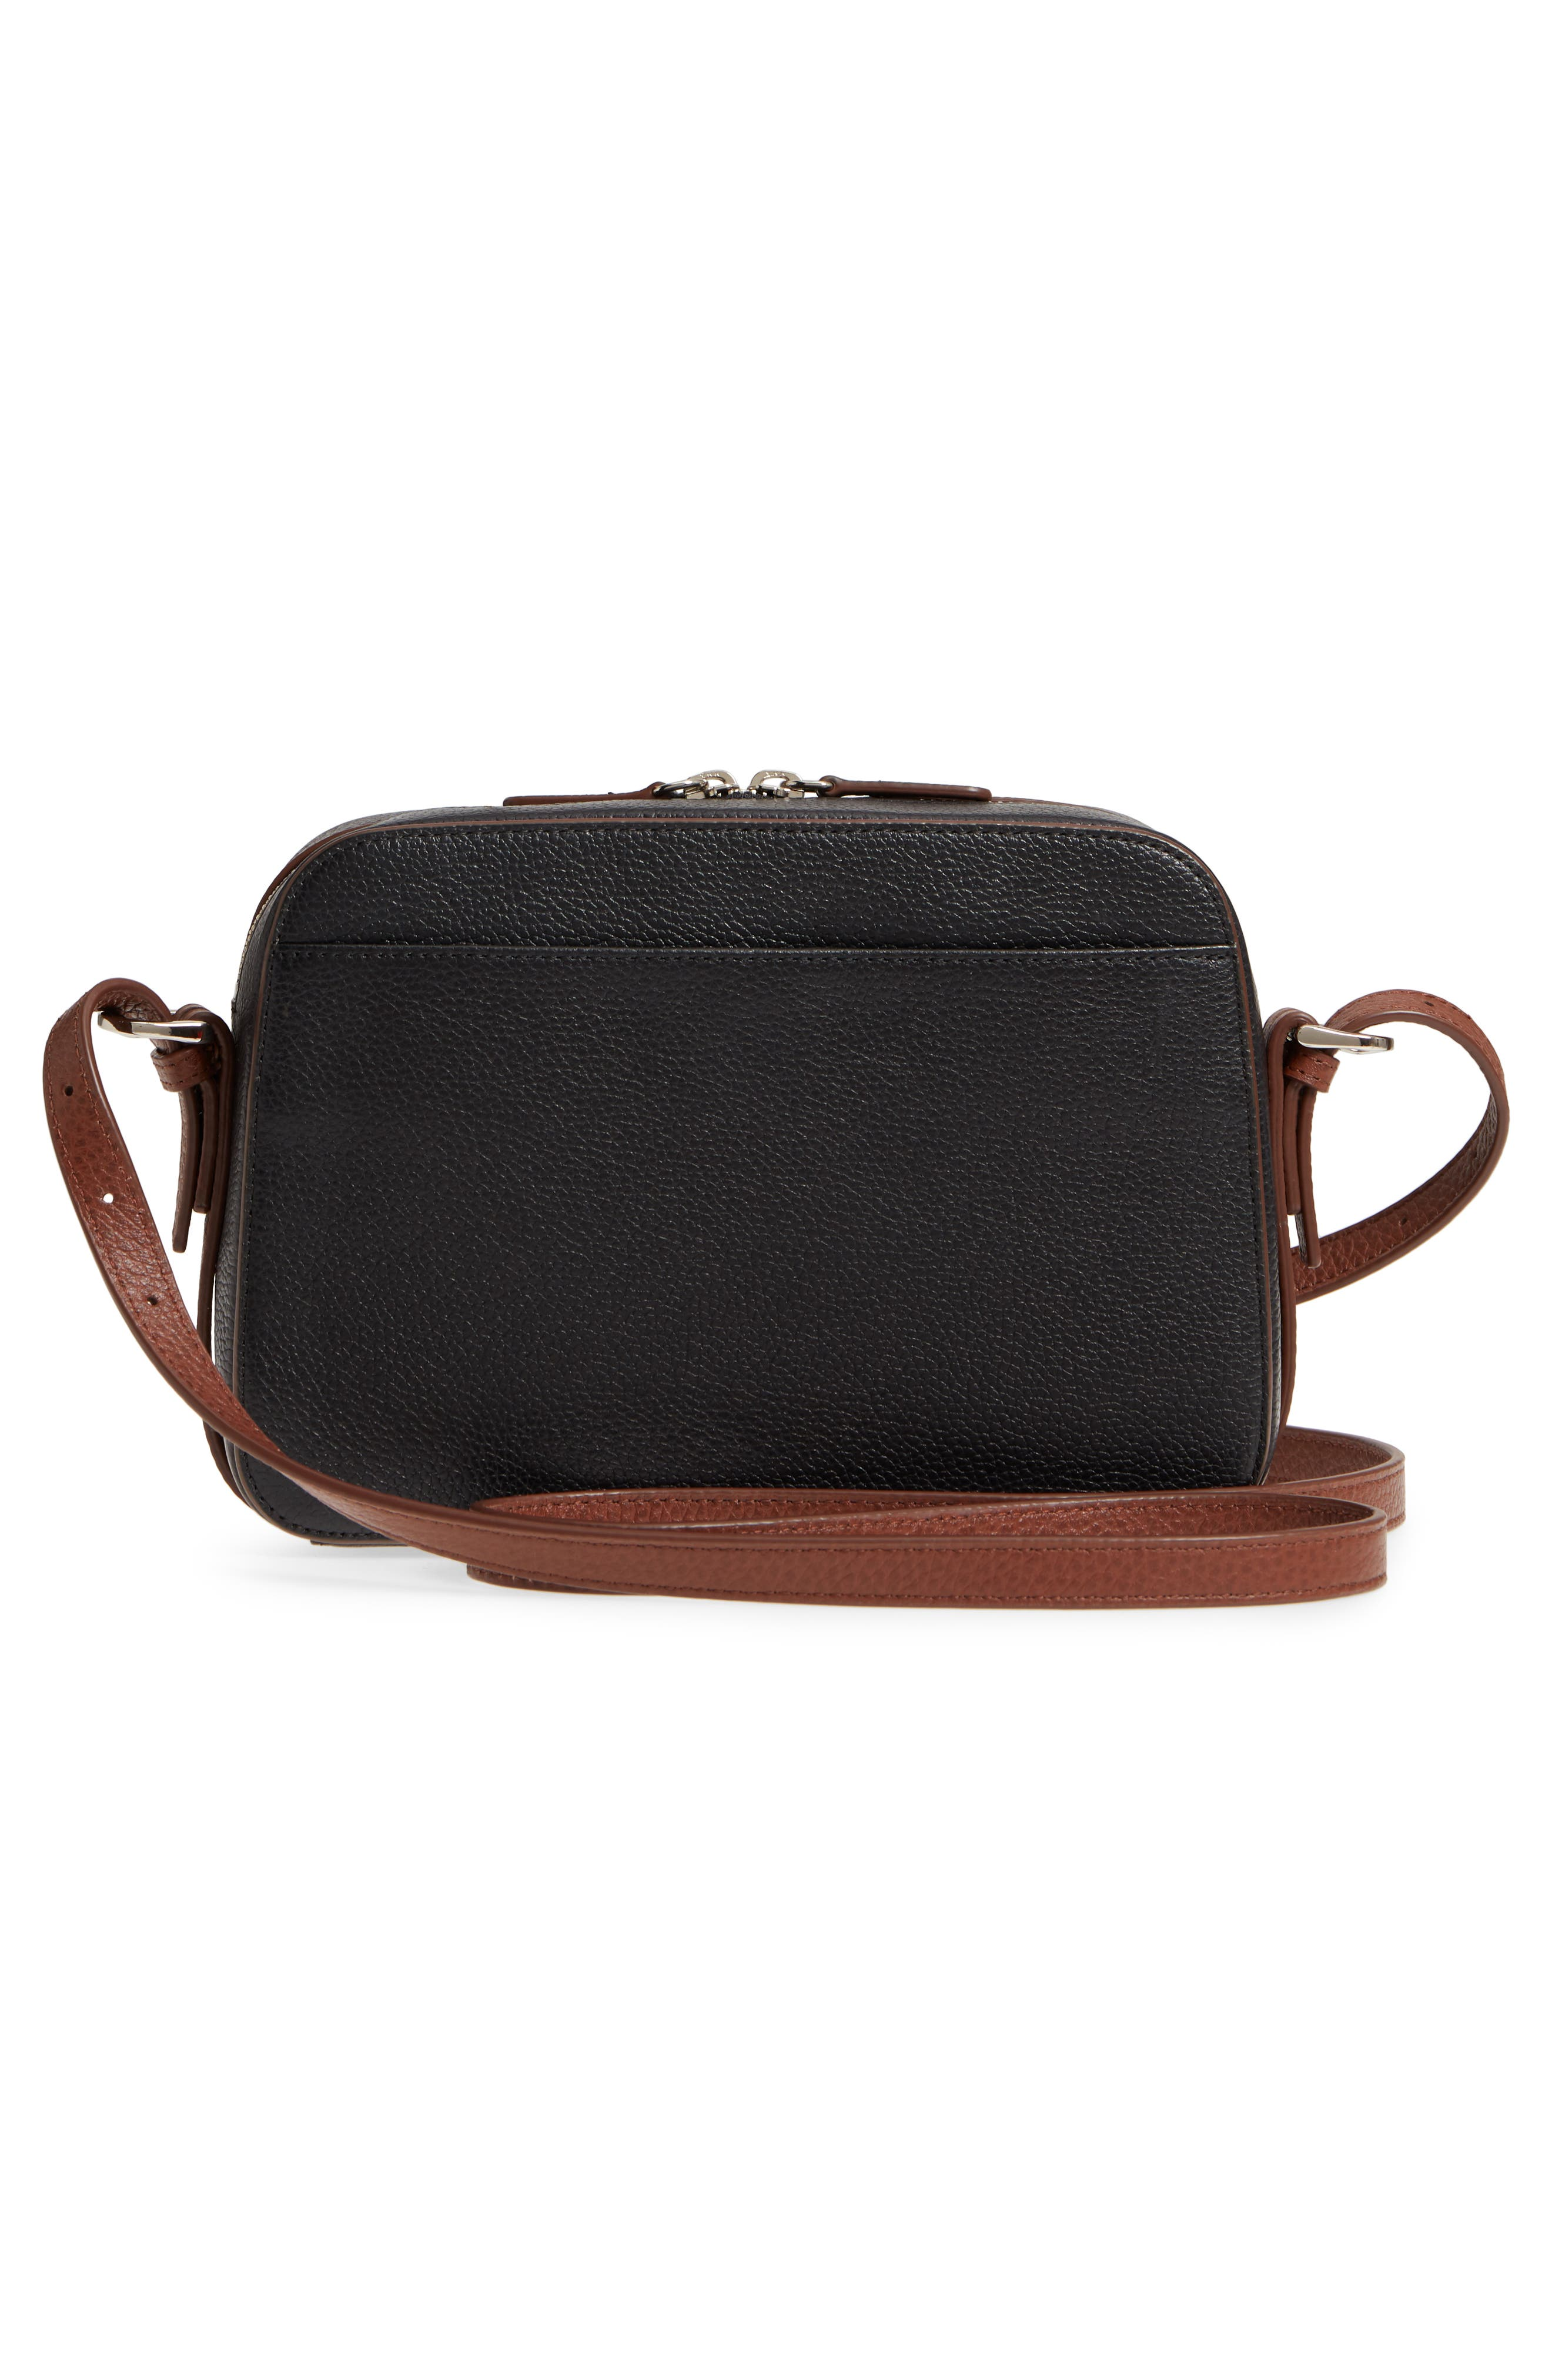 Brayden Leather Crossbody Camera Bag,                             Alternate thumbnail 12, color,